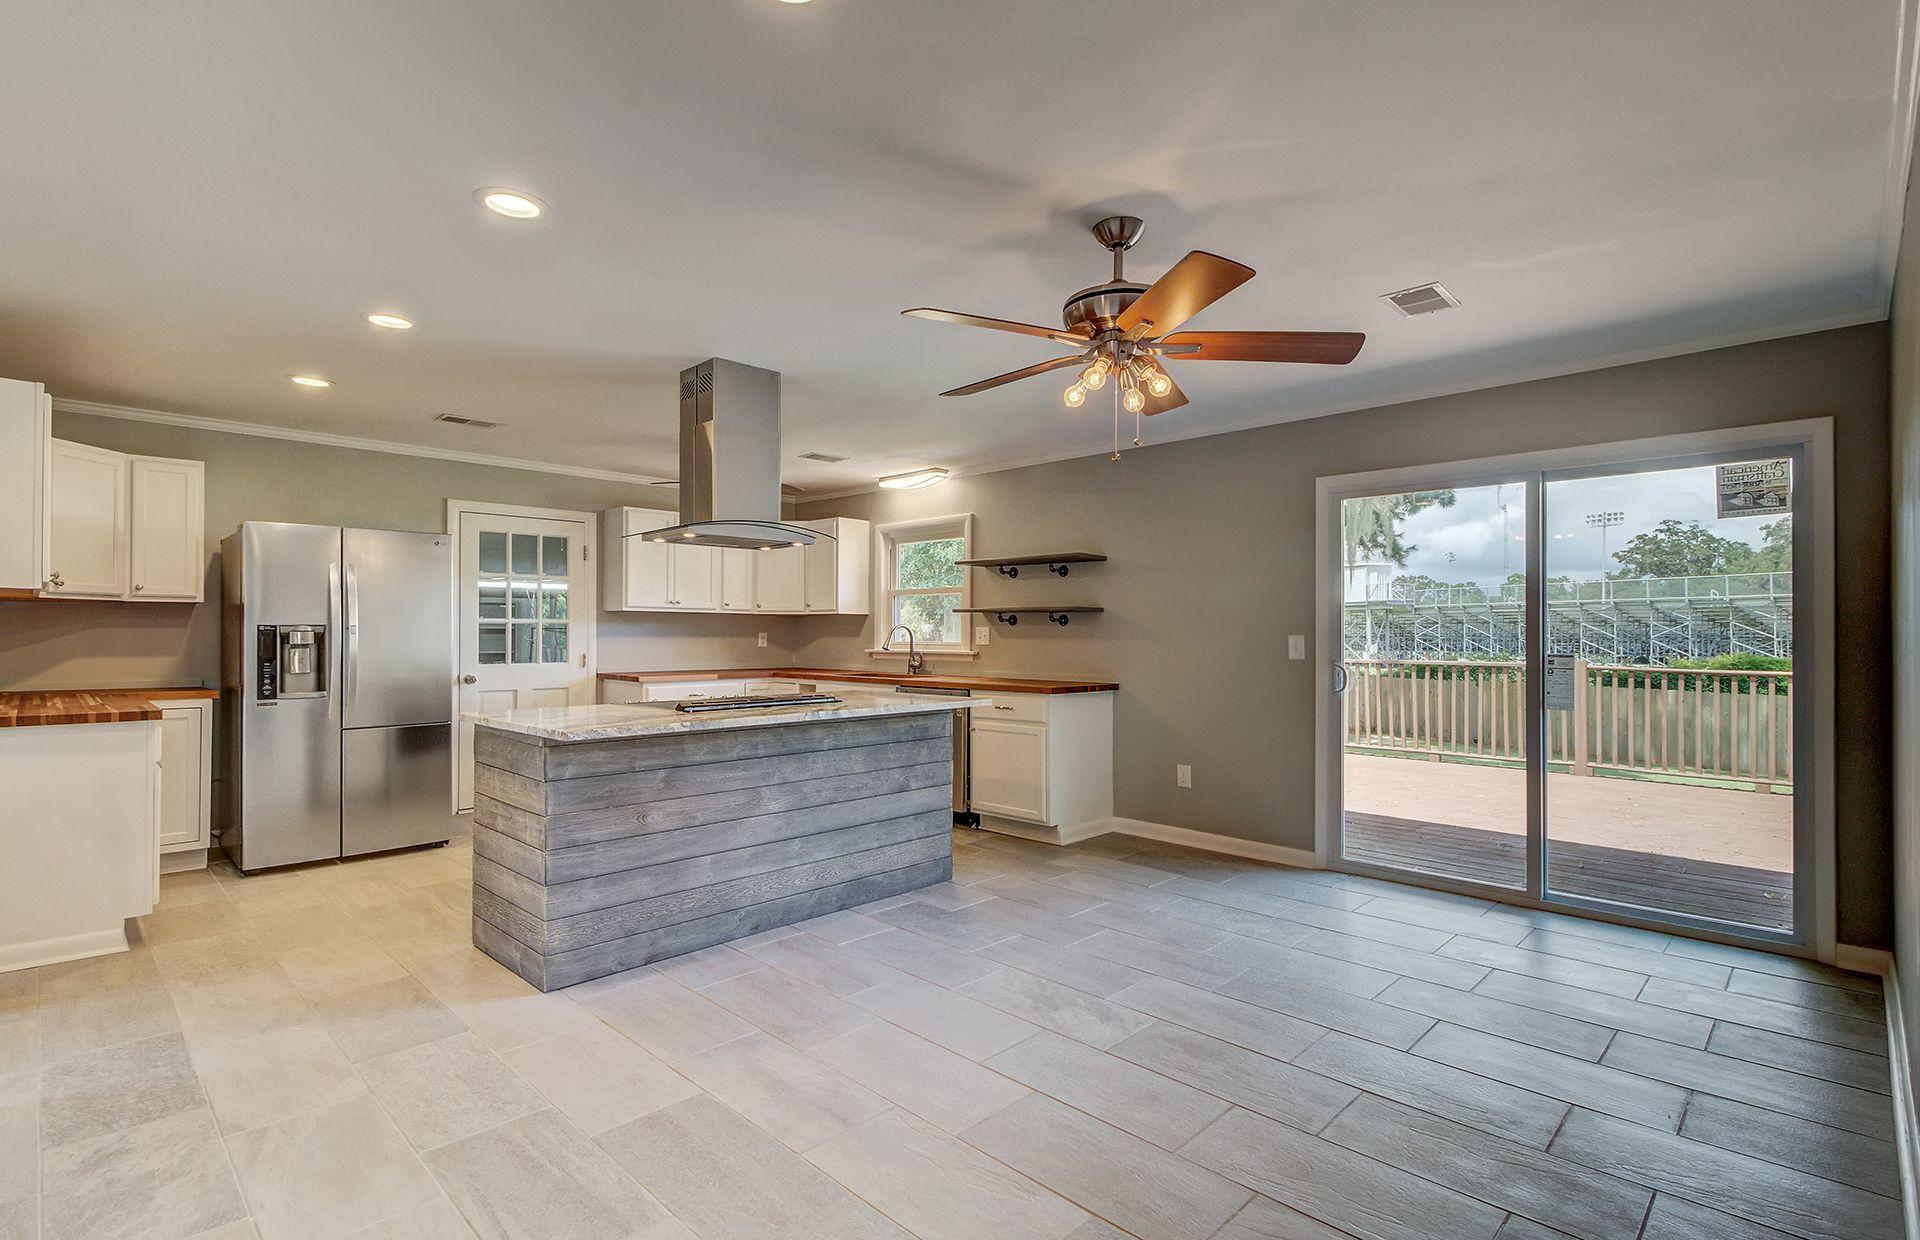 Belvedere Estates Homes For Sale - 6010 Ridgecrest, Hanahan, SC - 1